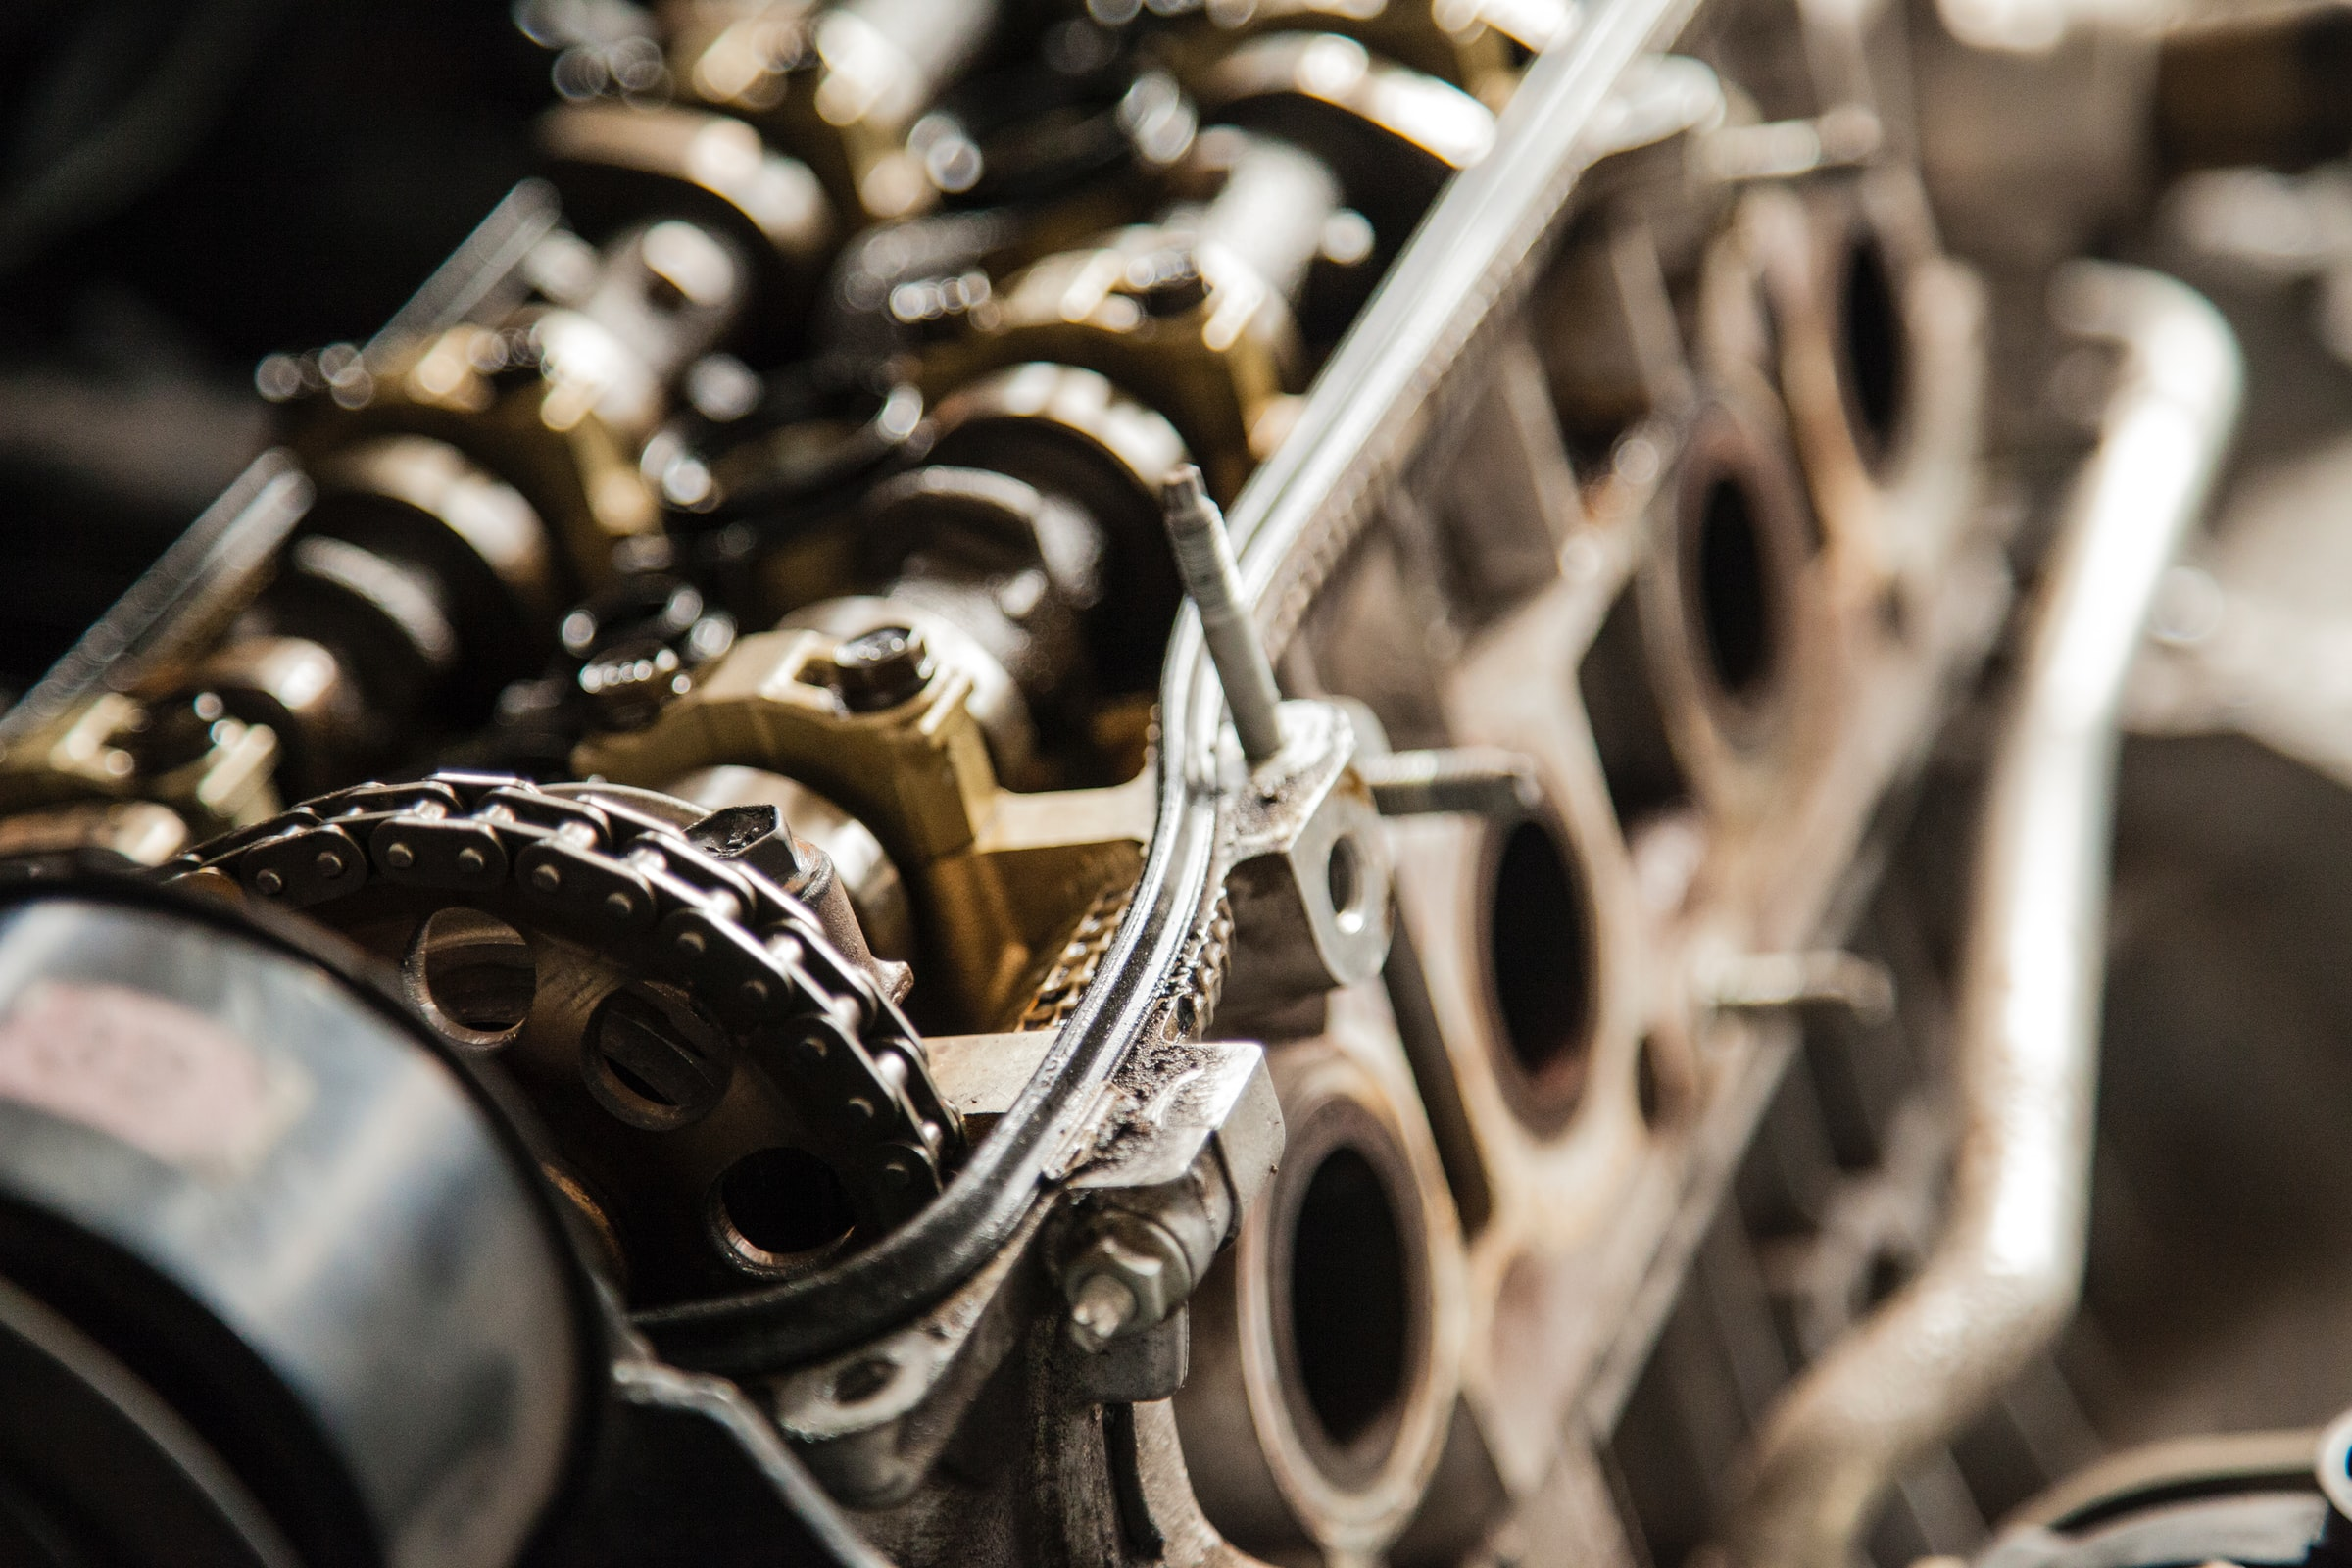 Engines & Ignition